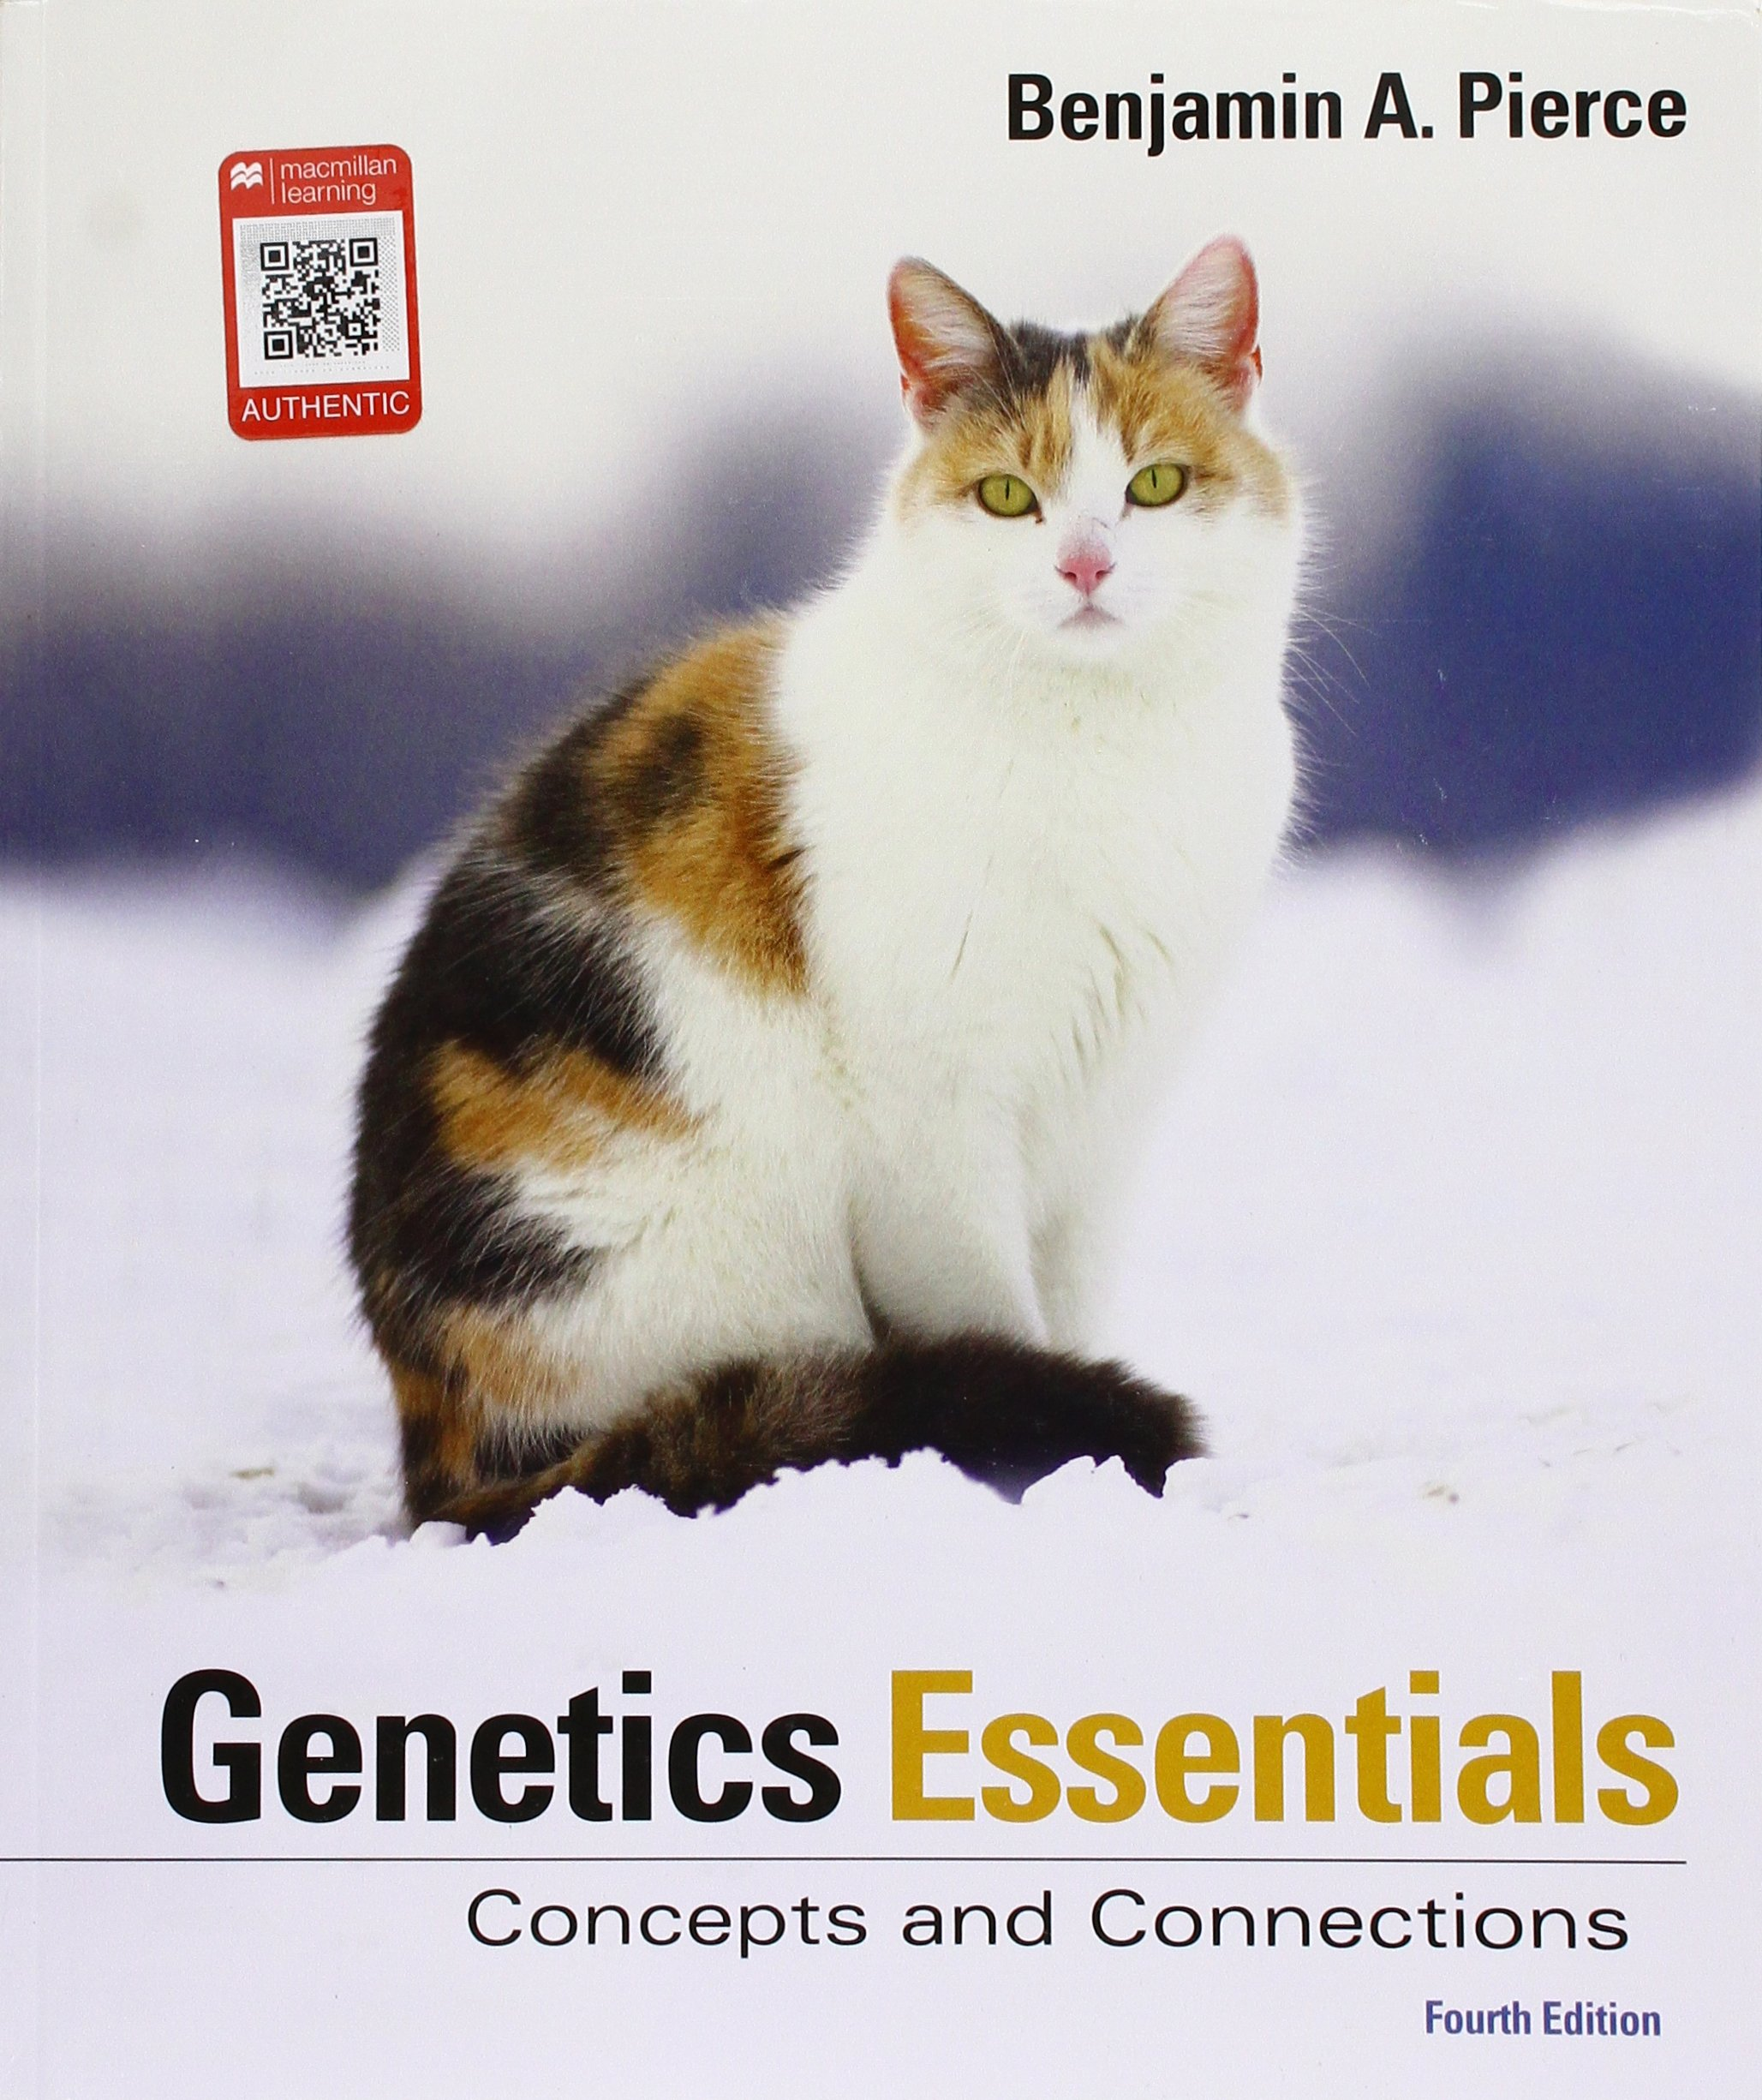 Genetics Essentials: Concepts and Connections: University Benjamin A  Pierce: 9781319107222: Genetics: Amazon Canada